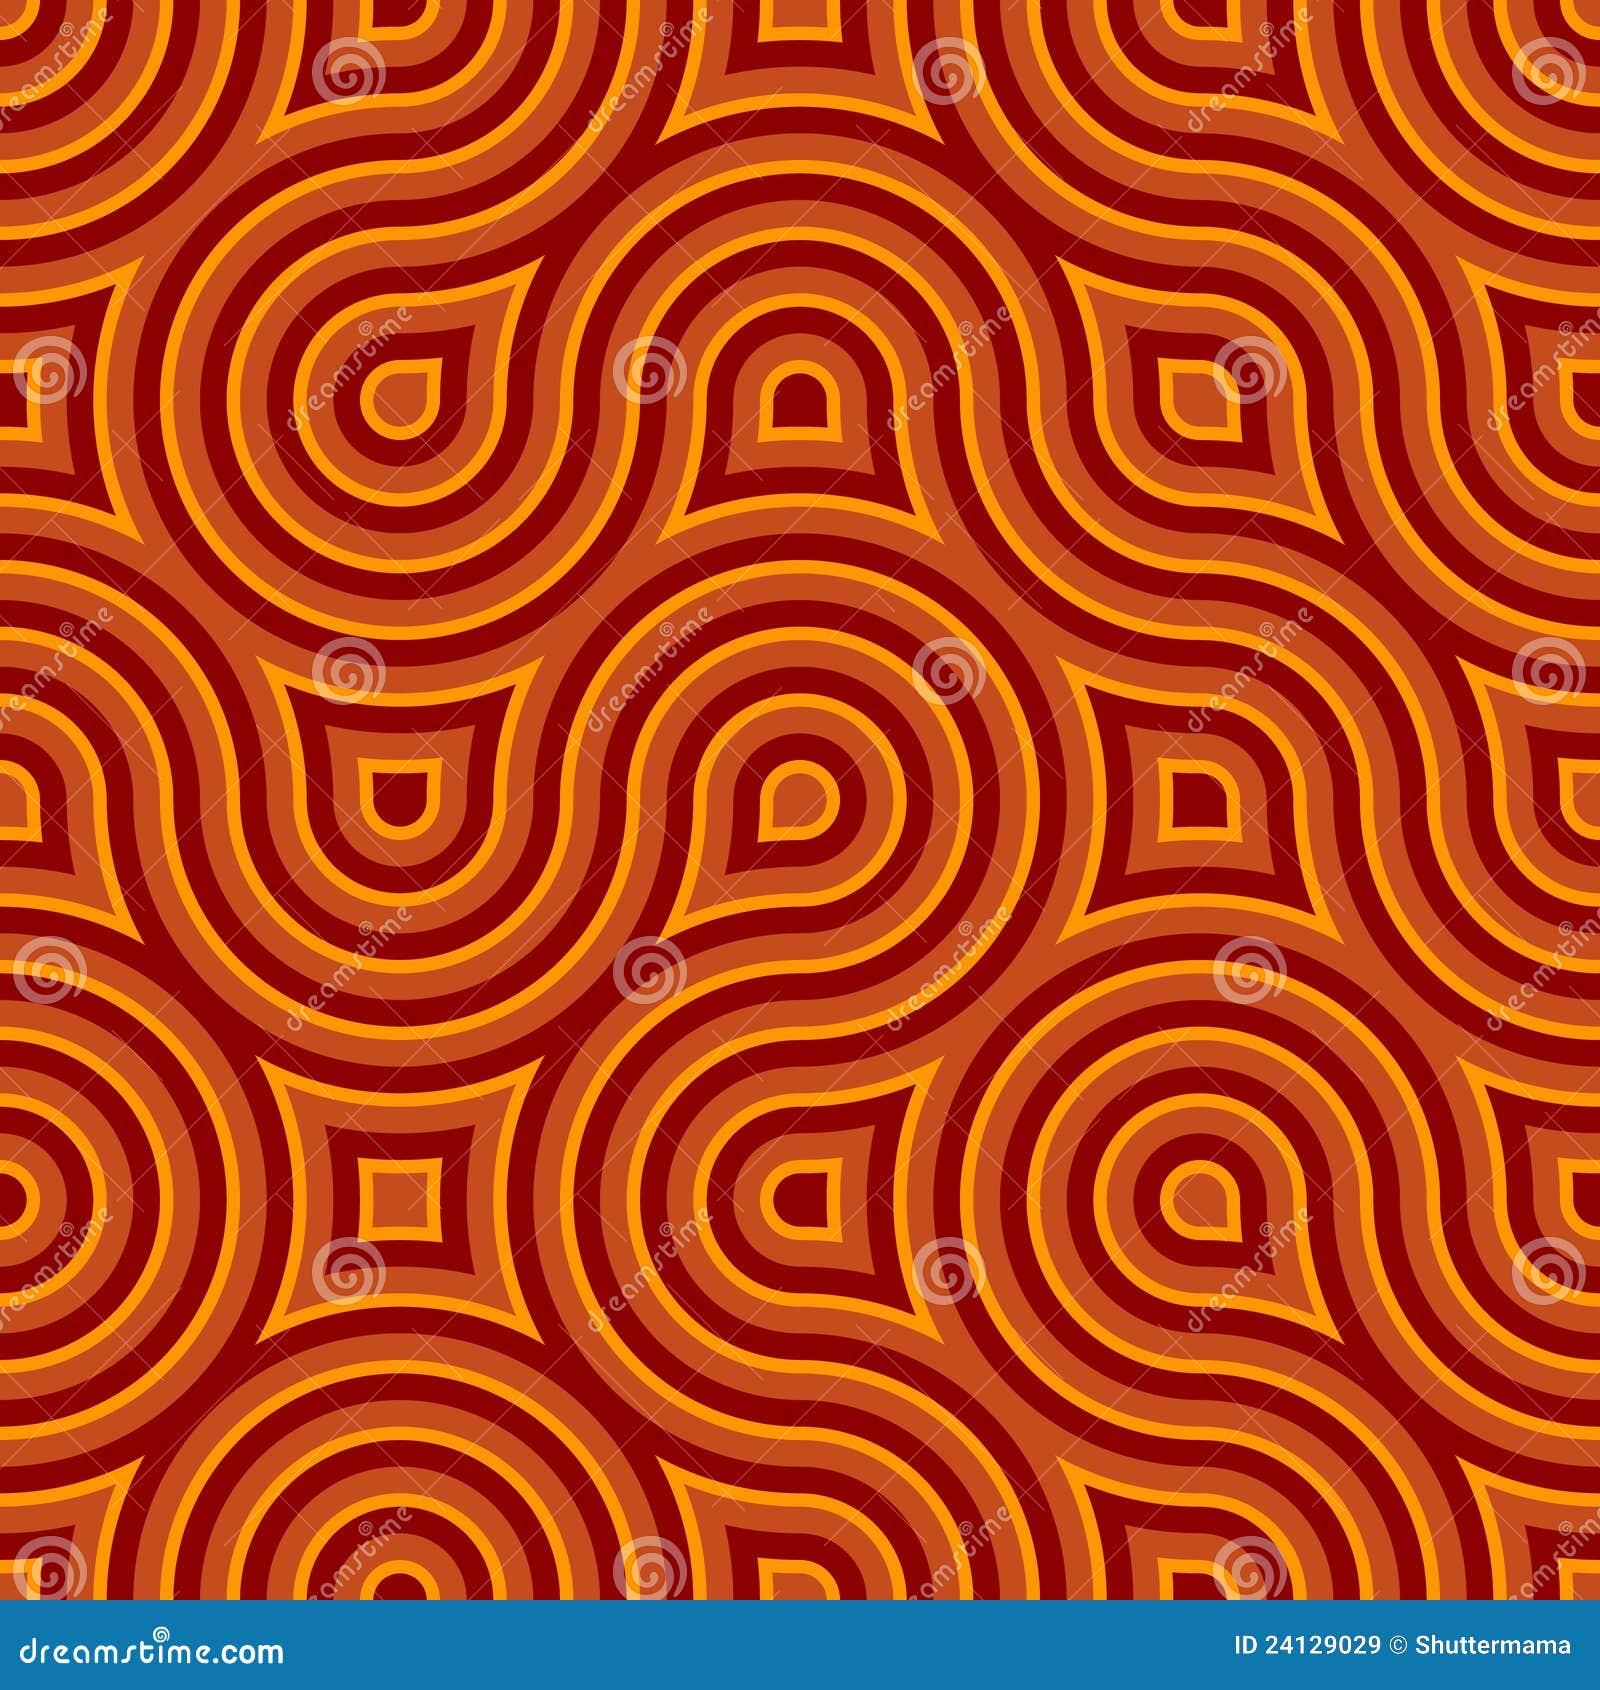 70s Wallpaper Pattern Patterns  retro love  Pinterest